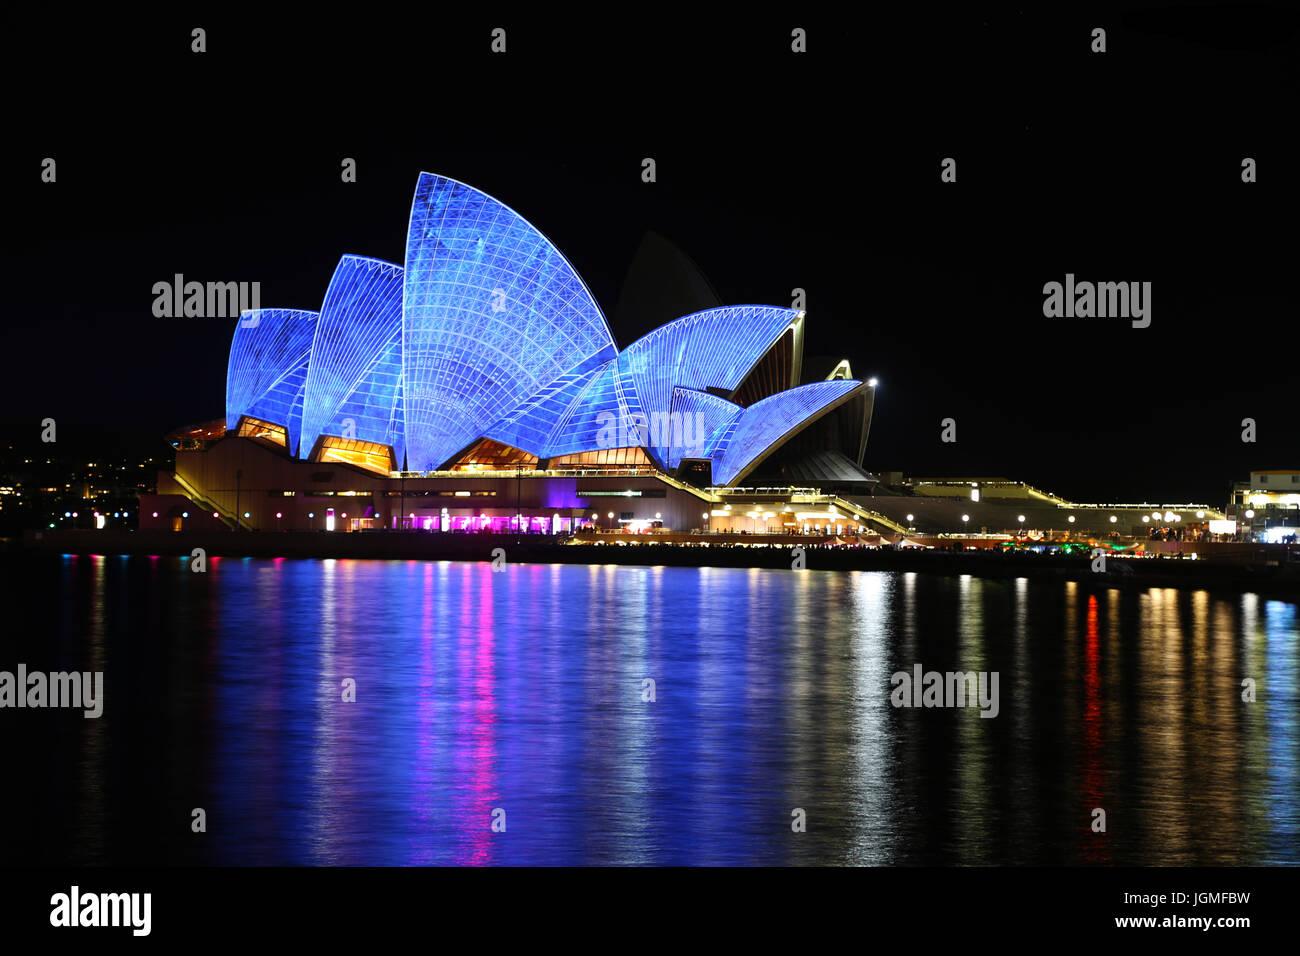 Australien, Sydney Opera House Nacht Bild Stockbild